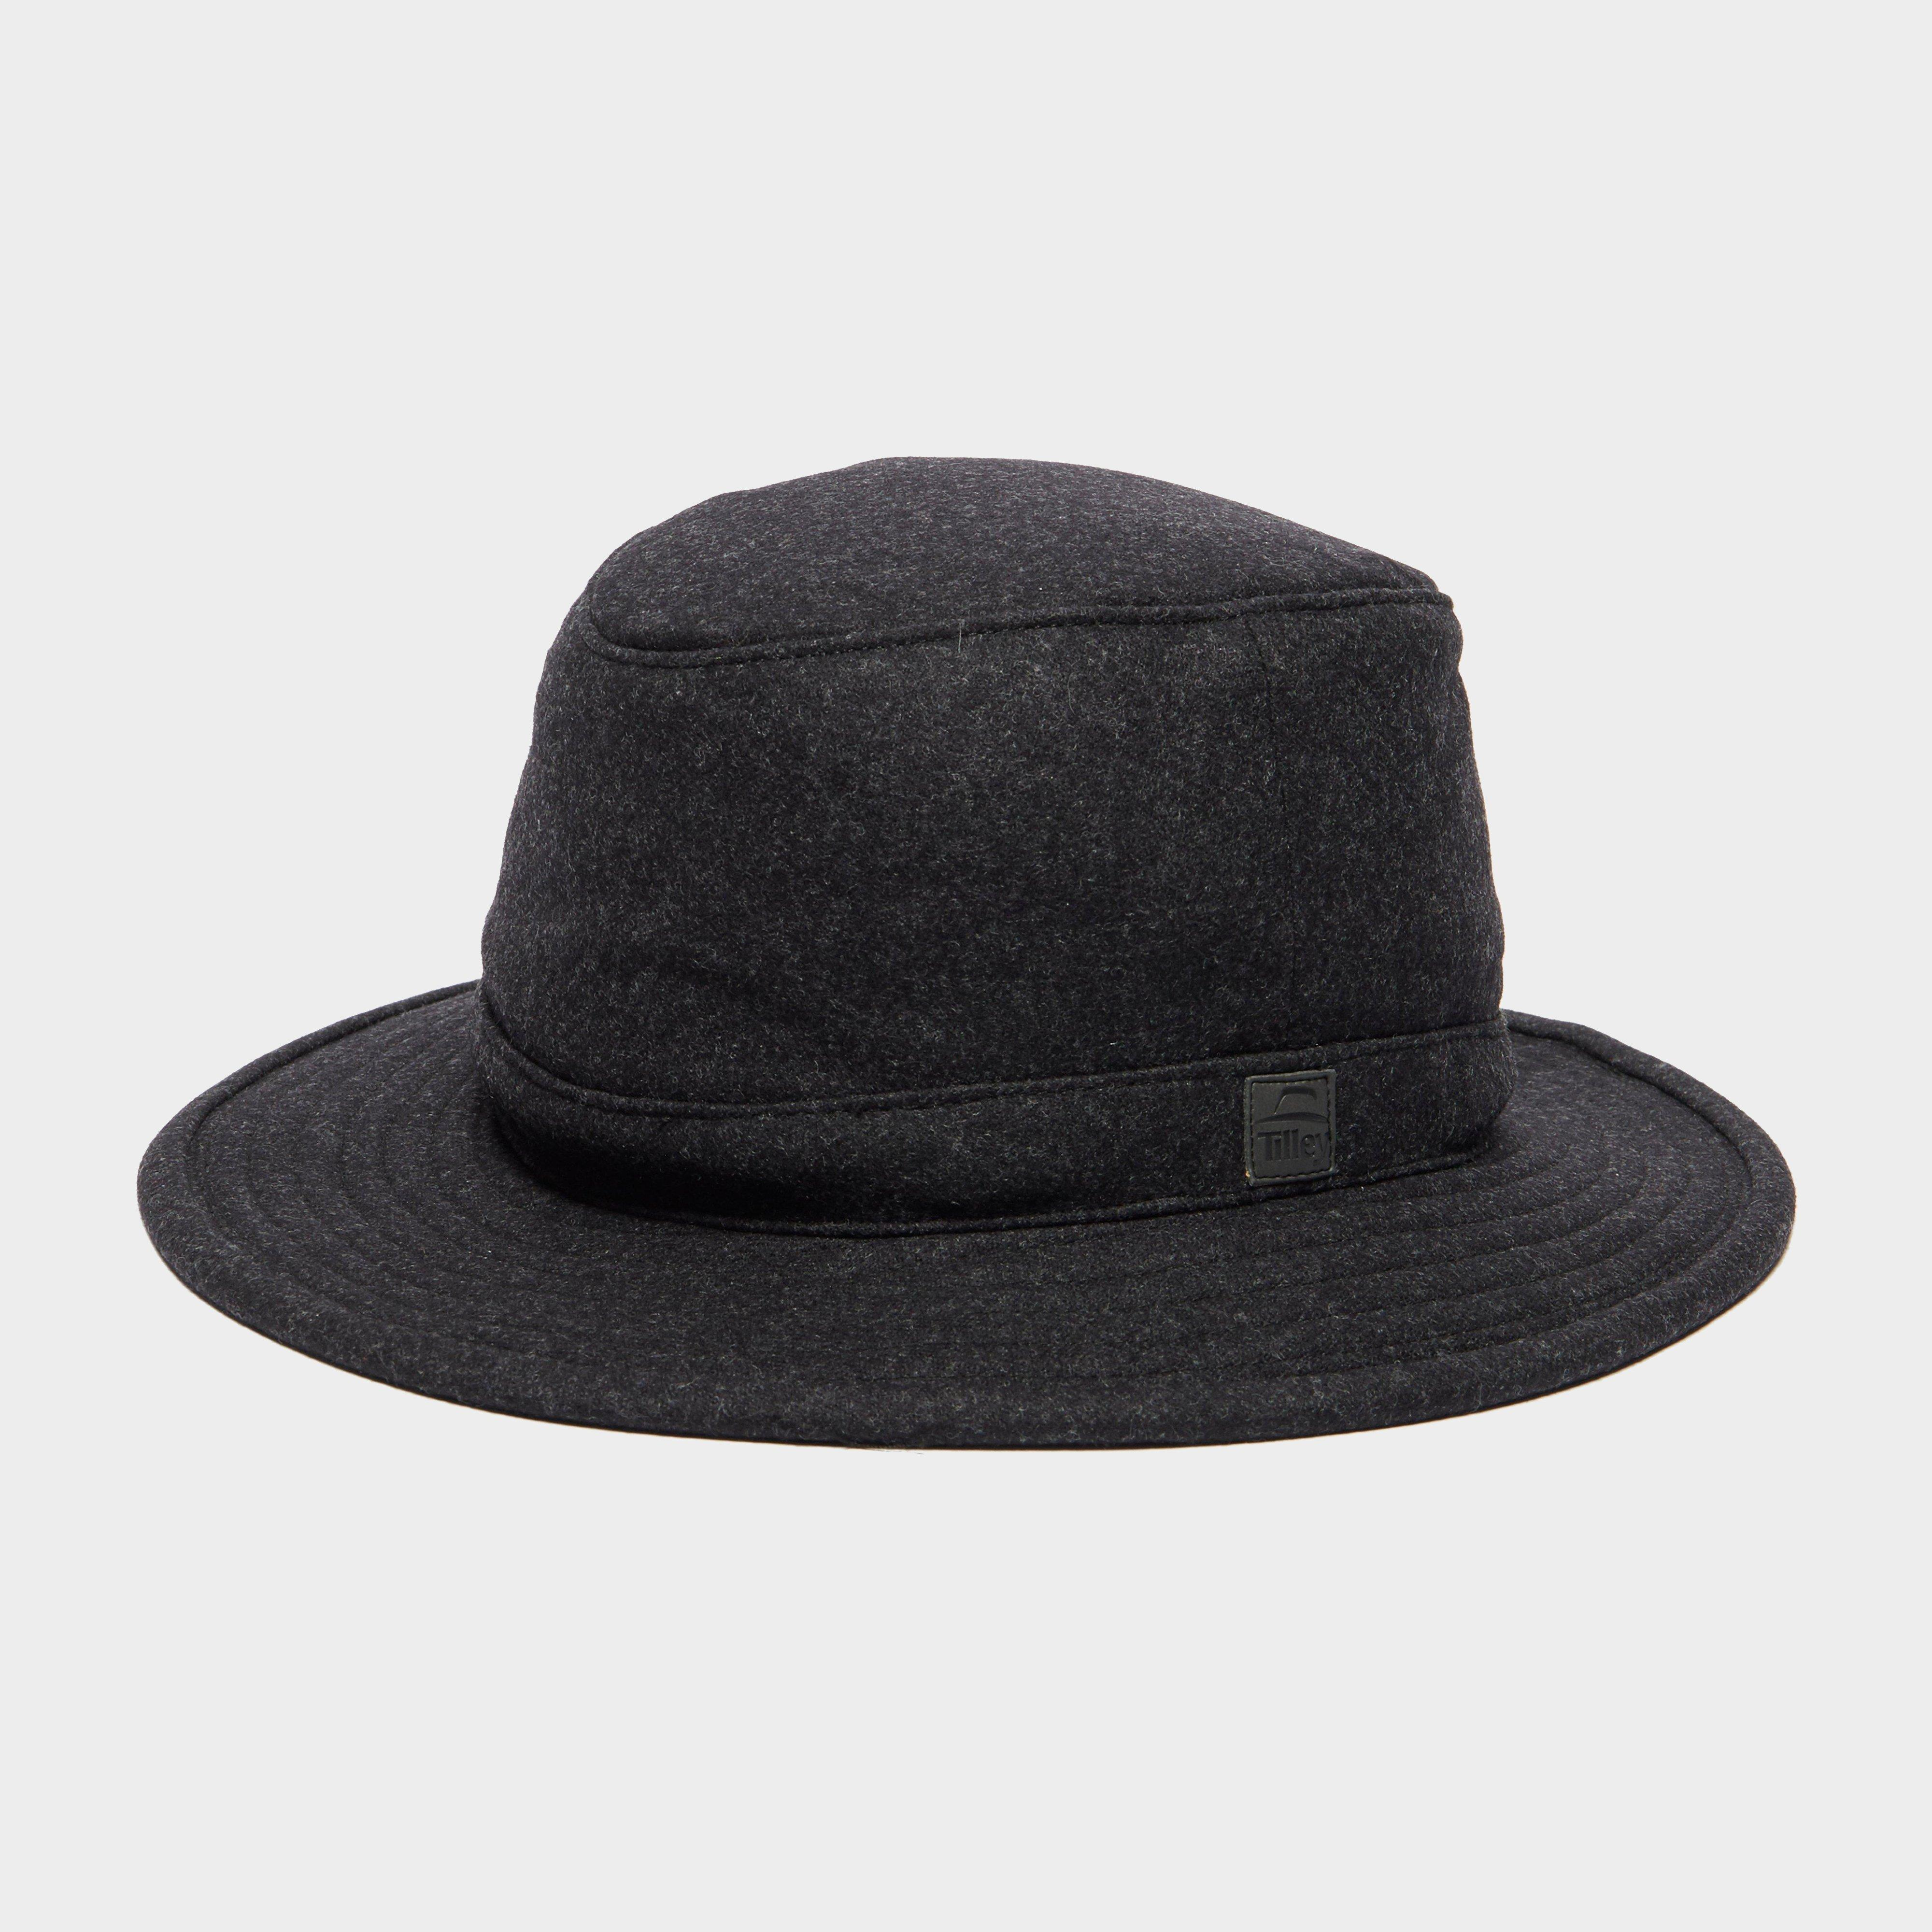 Tilley Tilley Mens TTW2 Tec Wool Hat - Black, Black